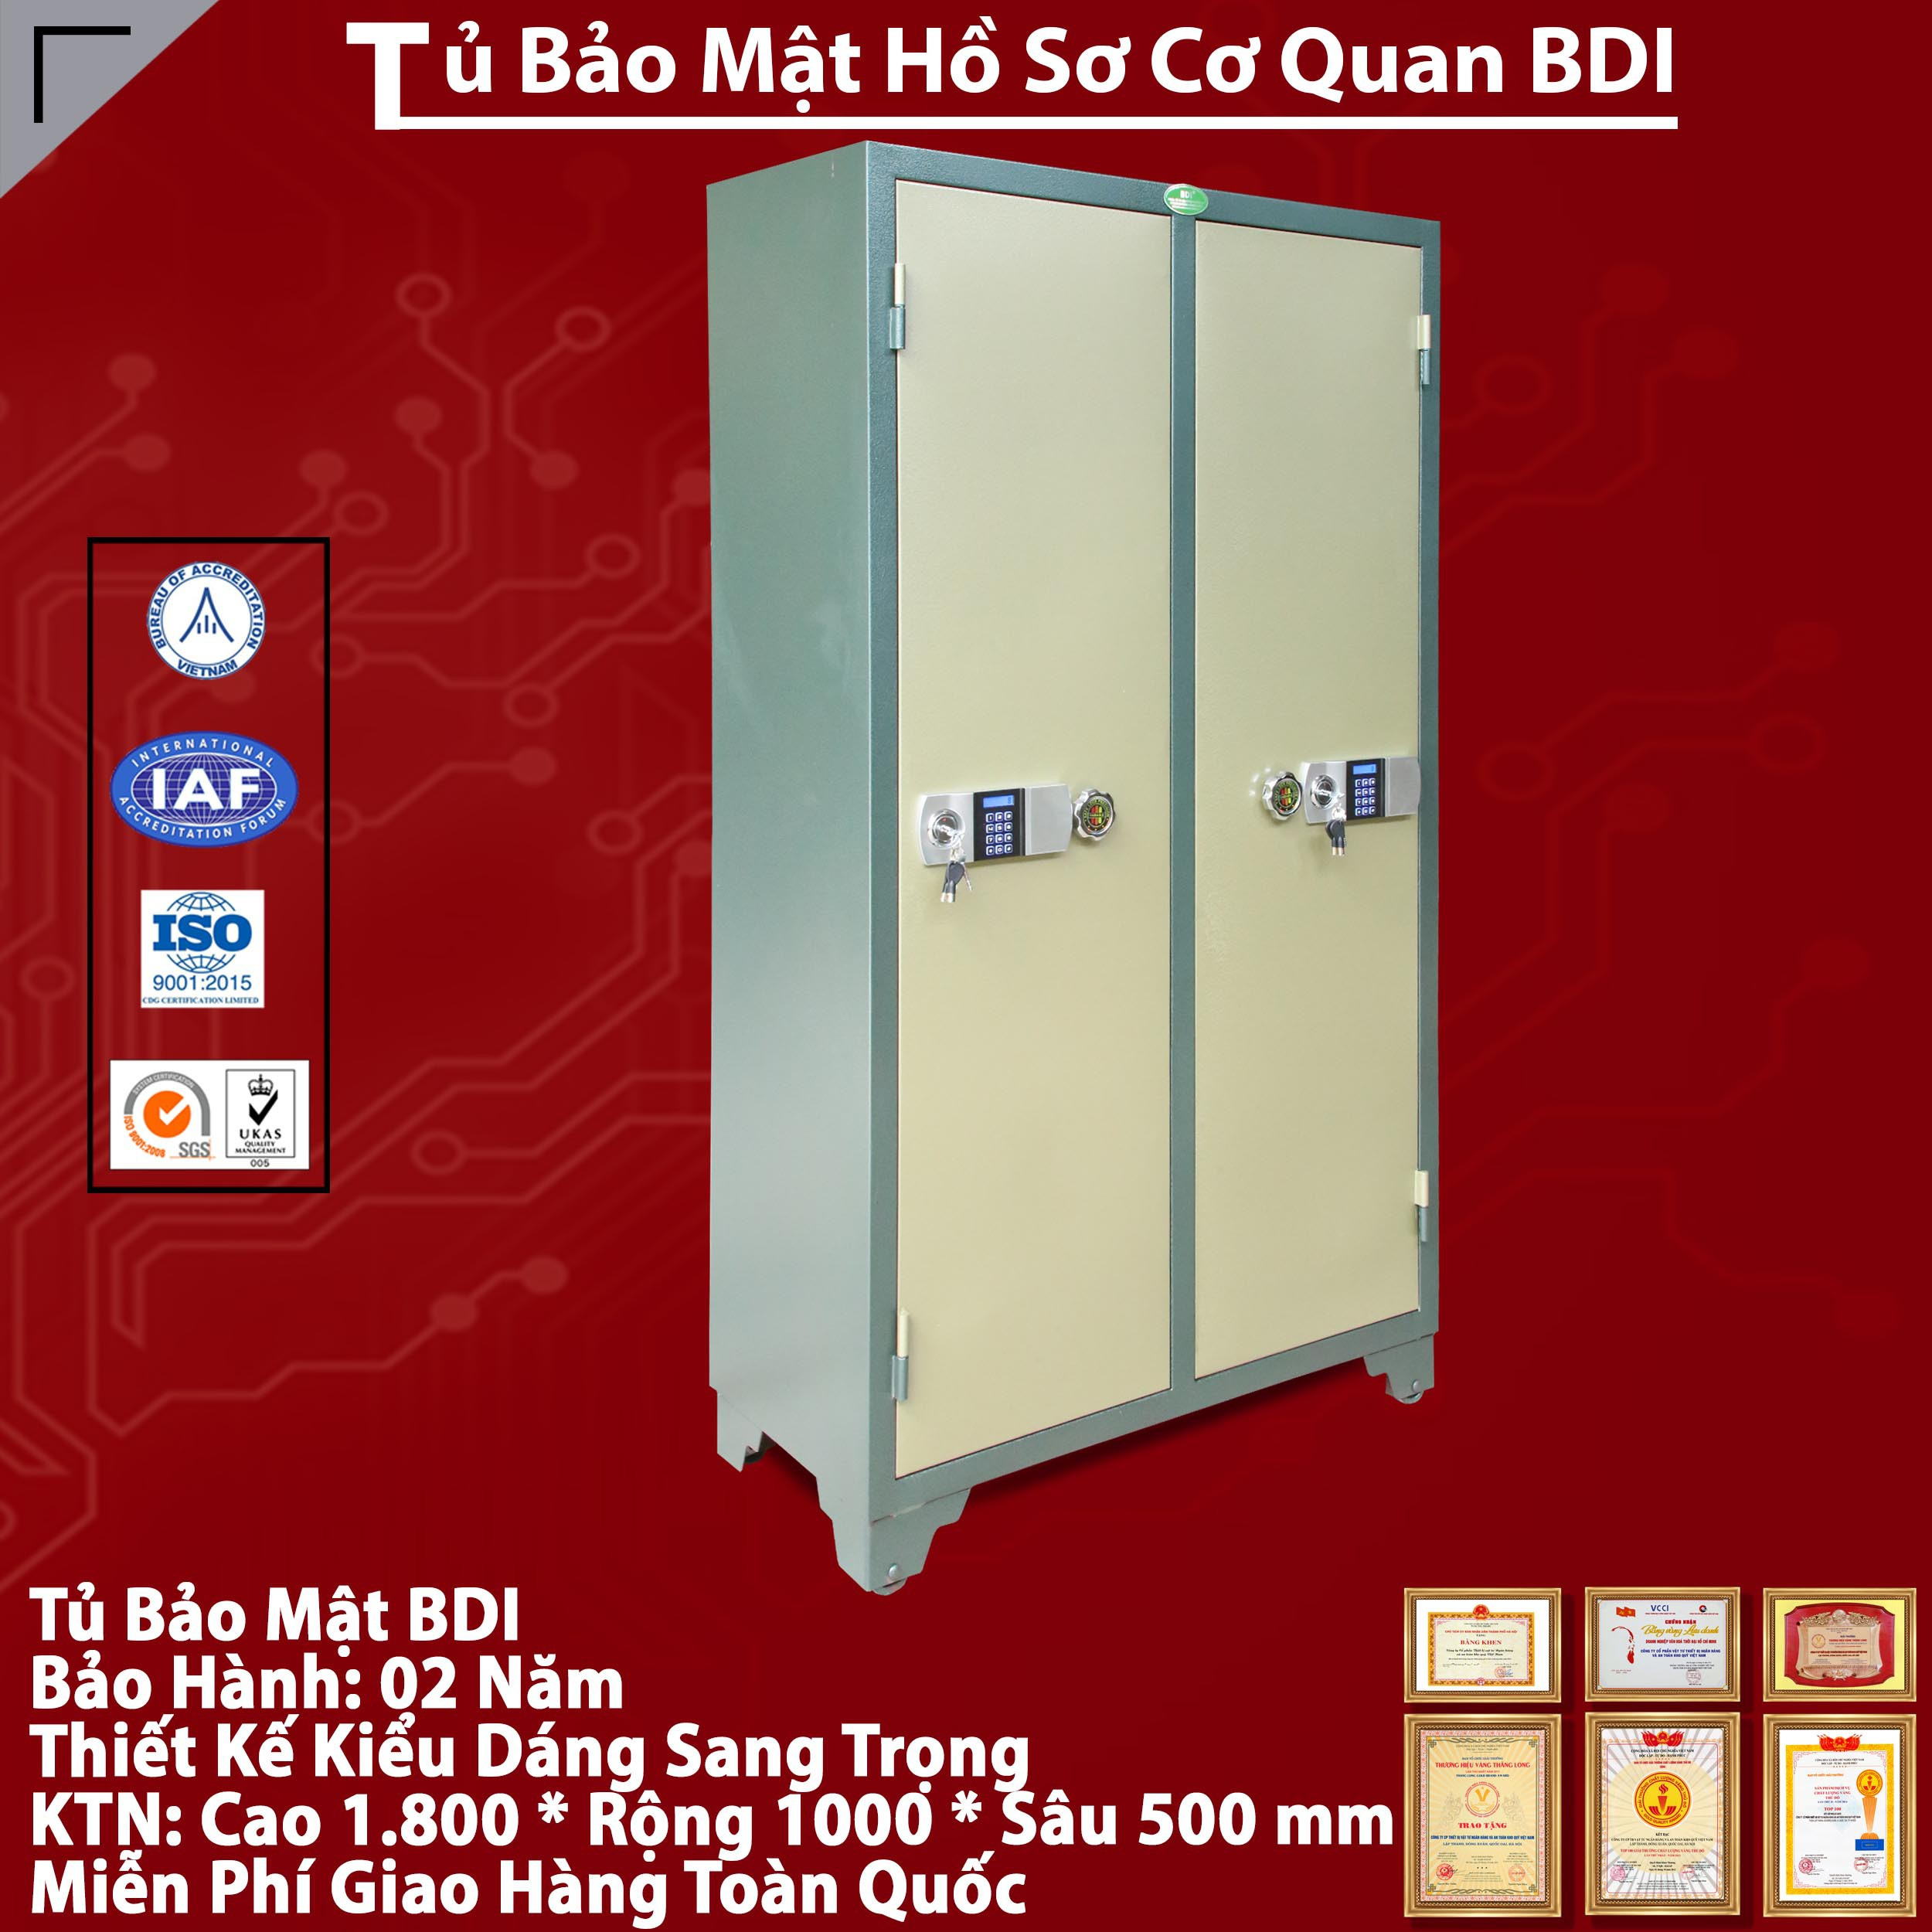 Tu Bao Mat 2 Canh Hien Dai Cao Cap